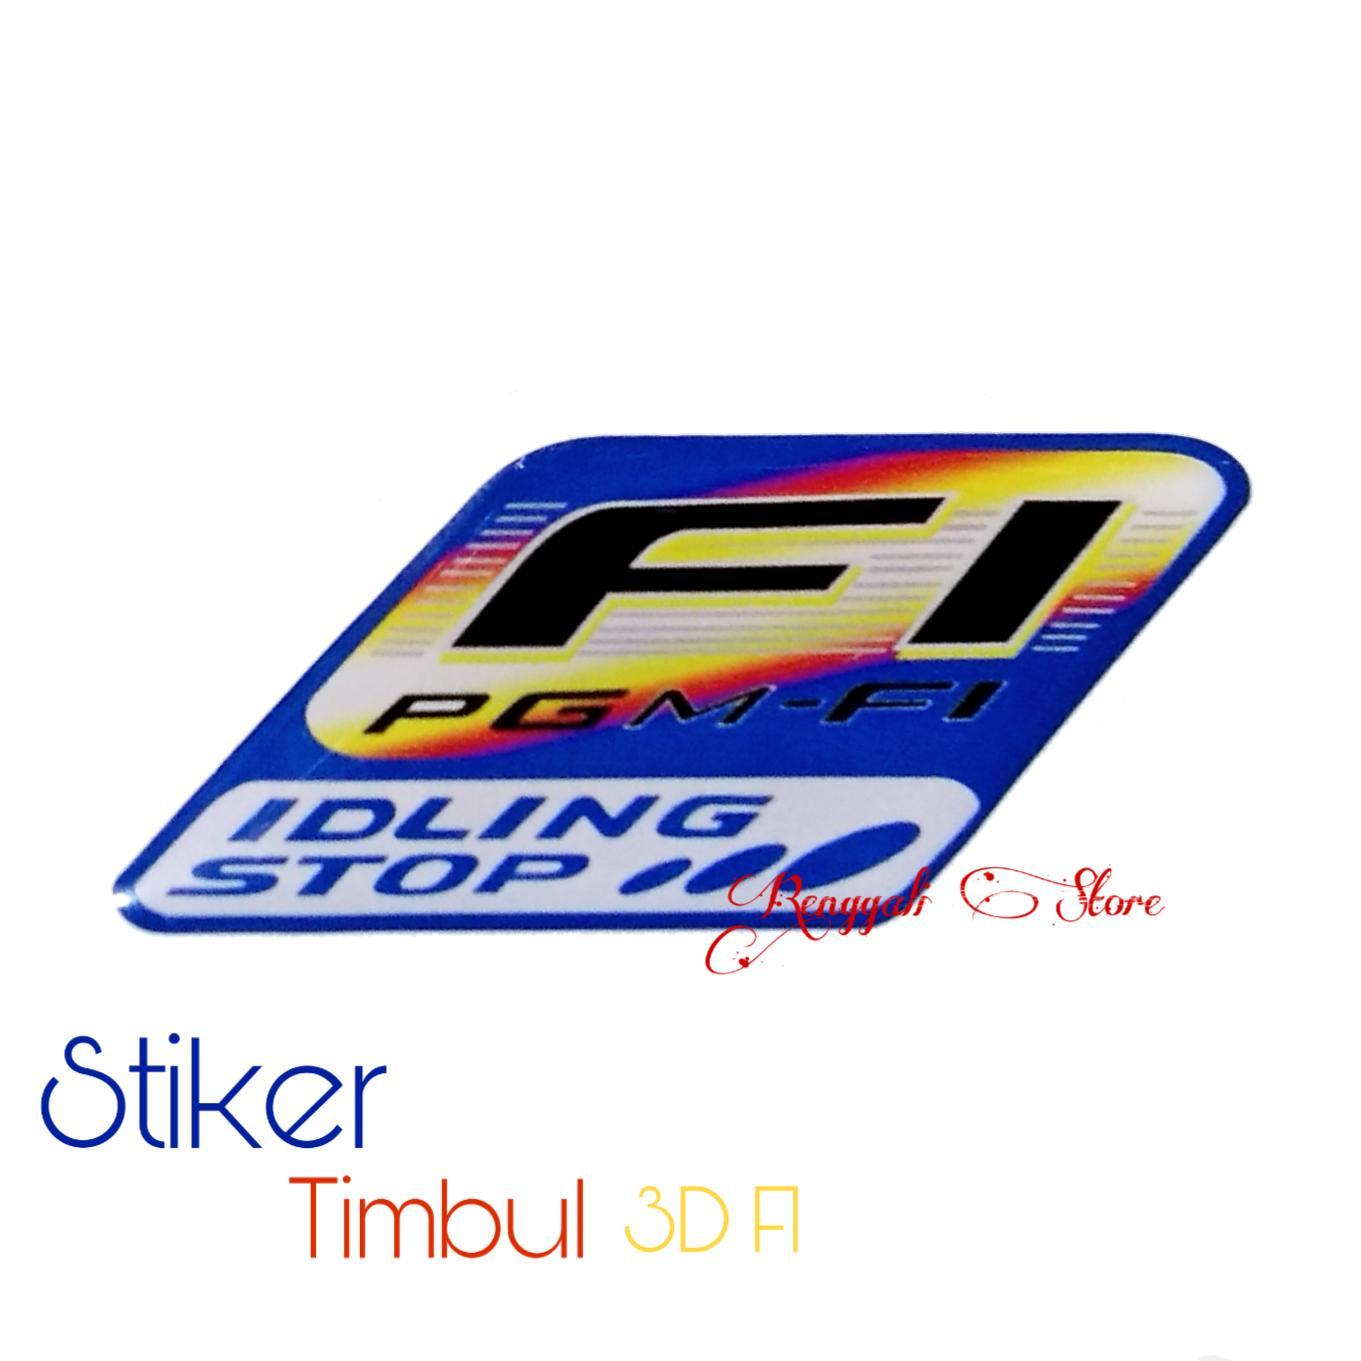 Stiker timbul emblem logo fgm fi 1 pcs emblem logo fgm fi